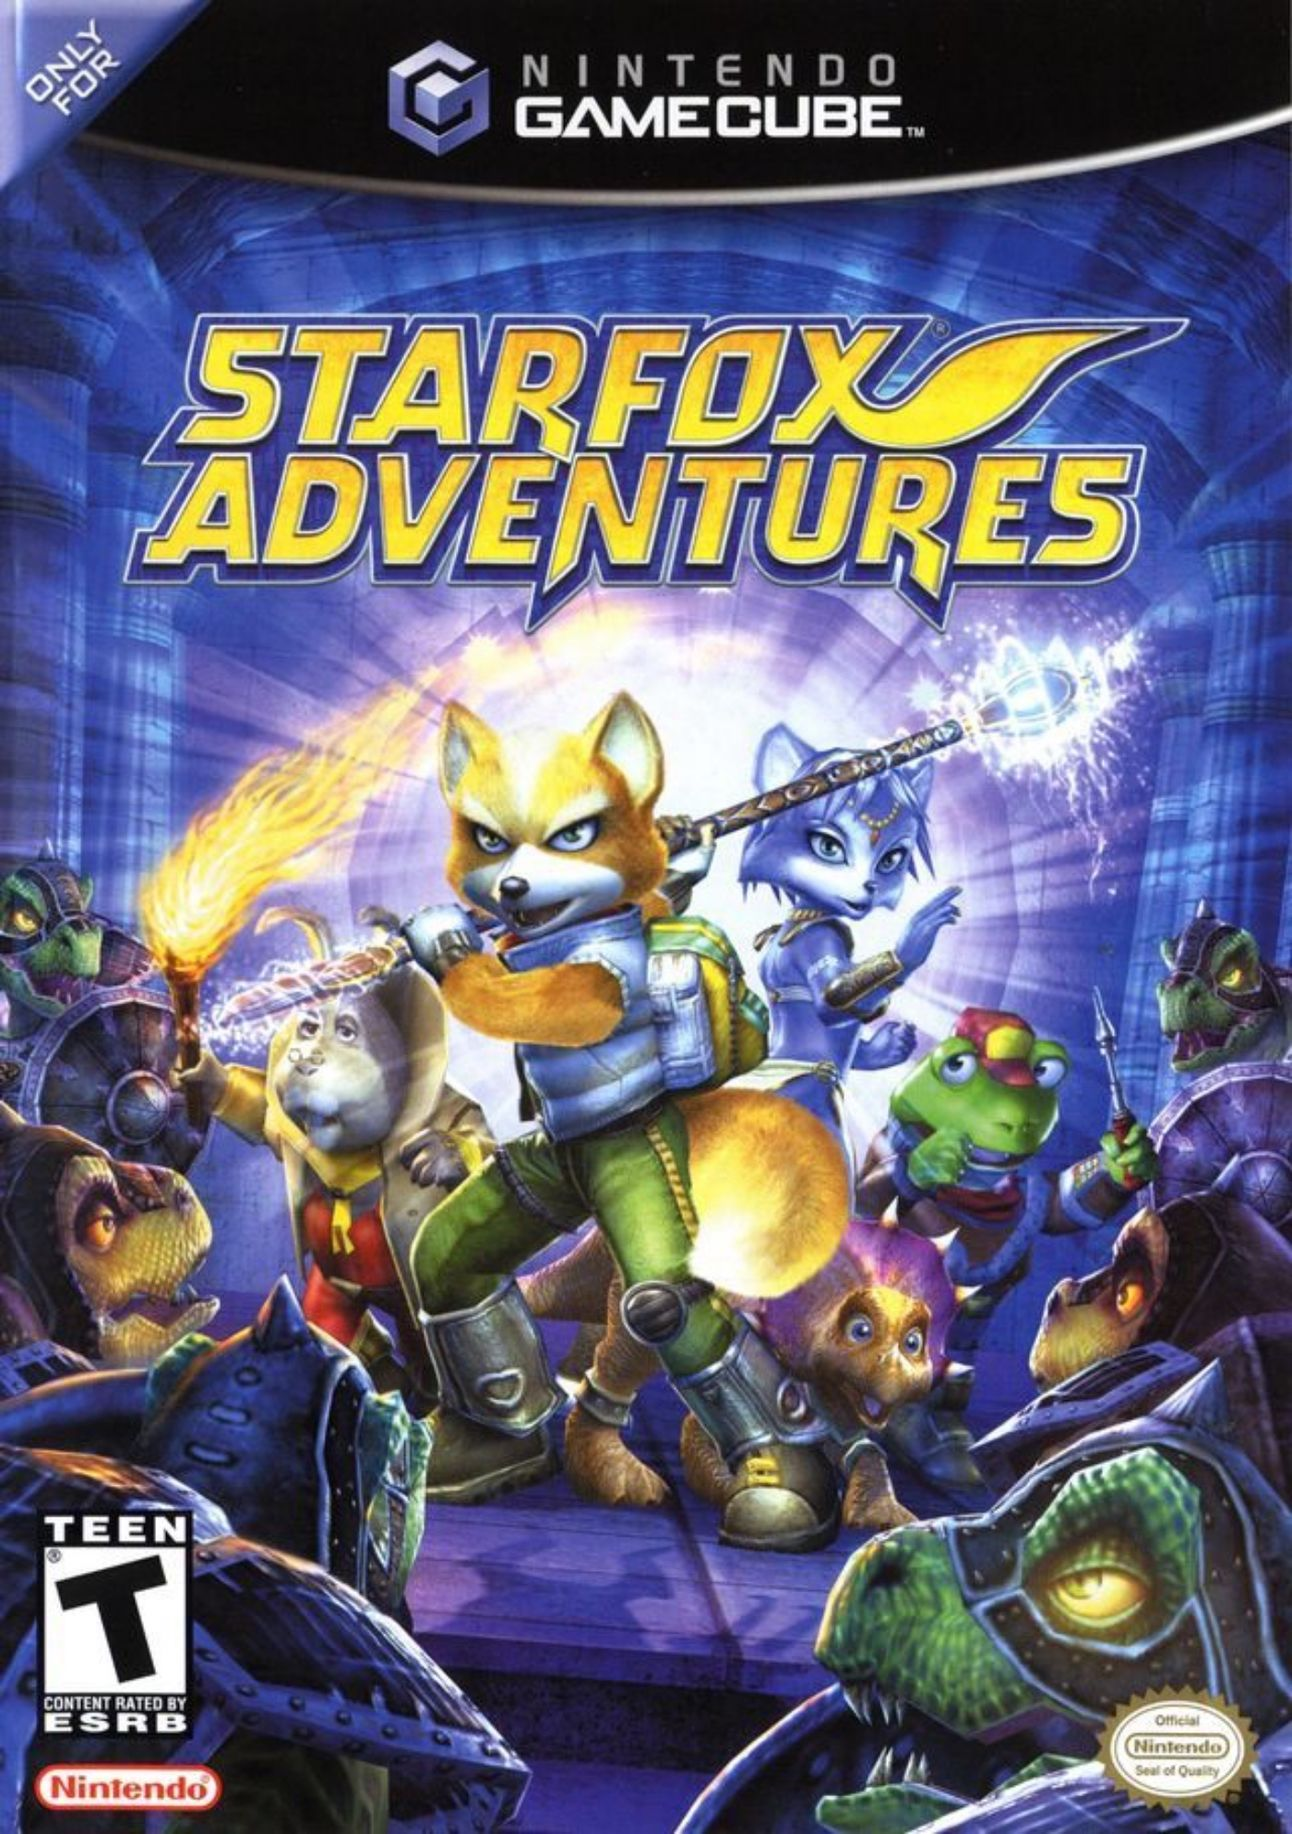 44440b9e4077f16336f11f44748181e3--gamecube-games-star-fox.jpg